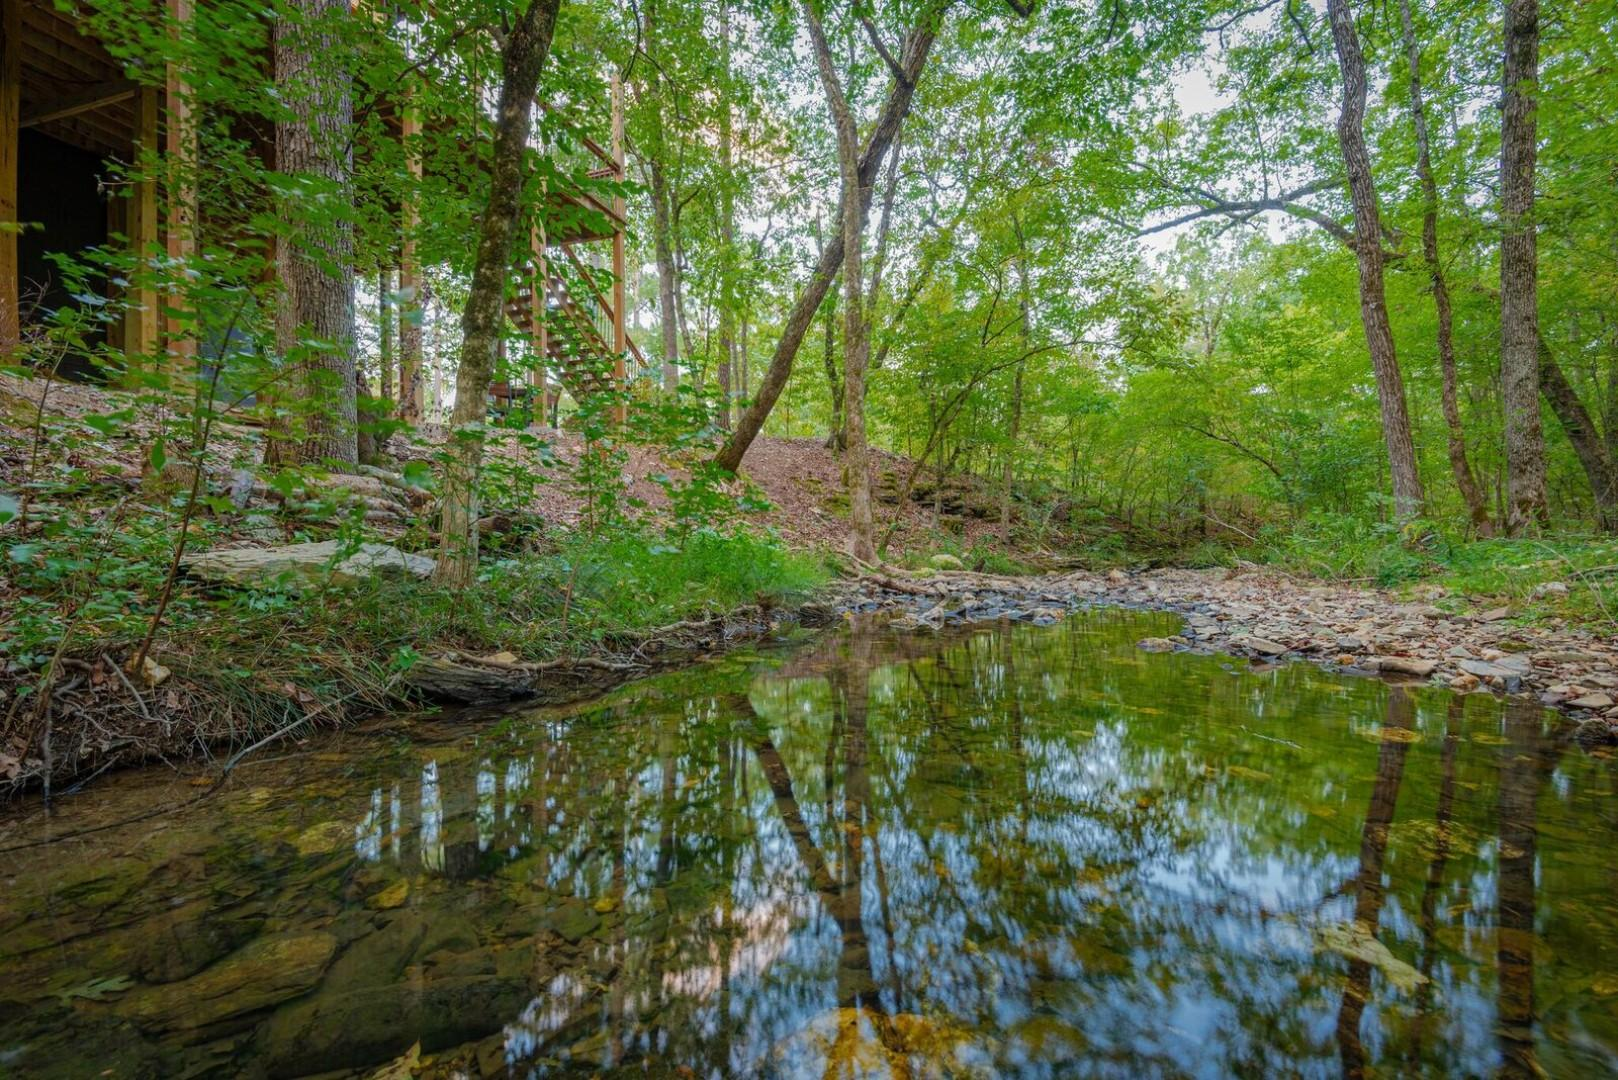 Serene on the Stream